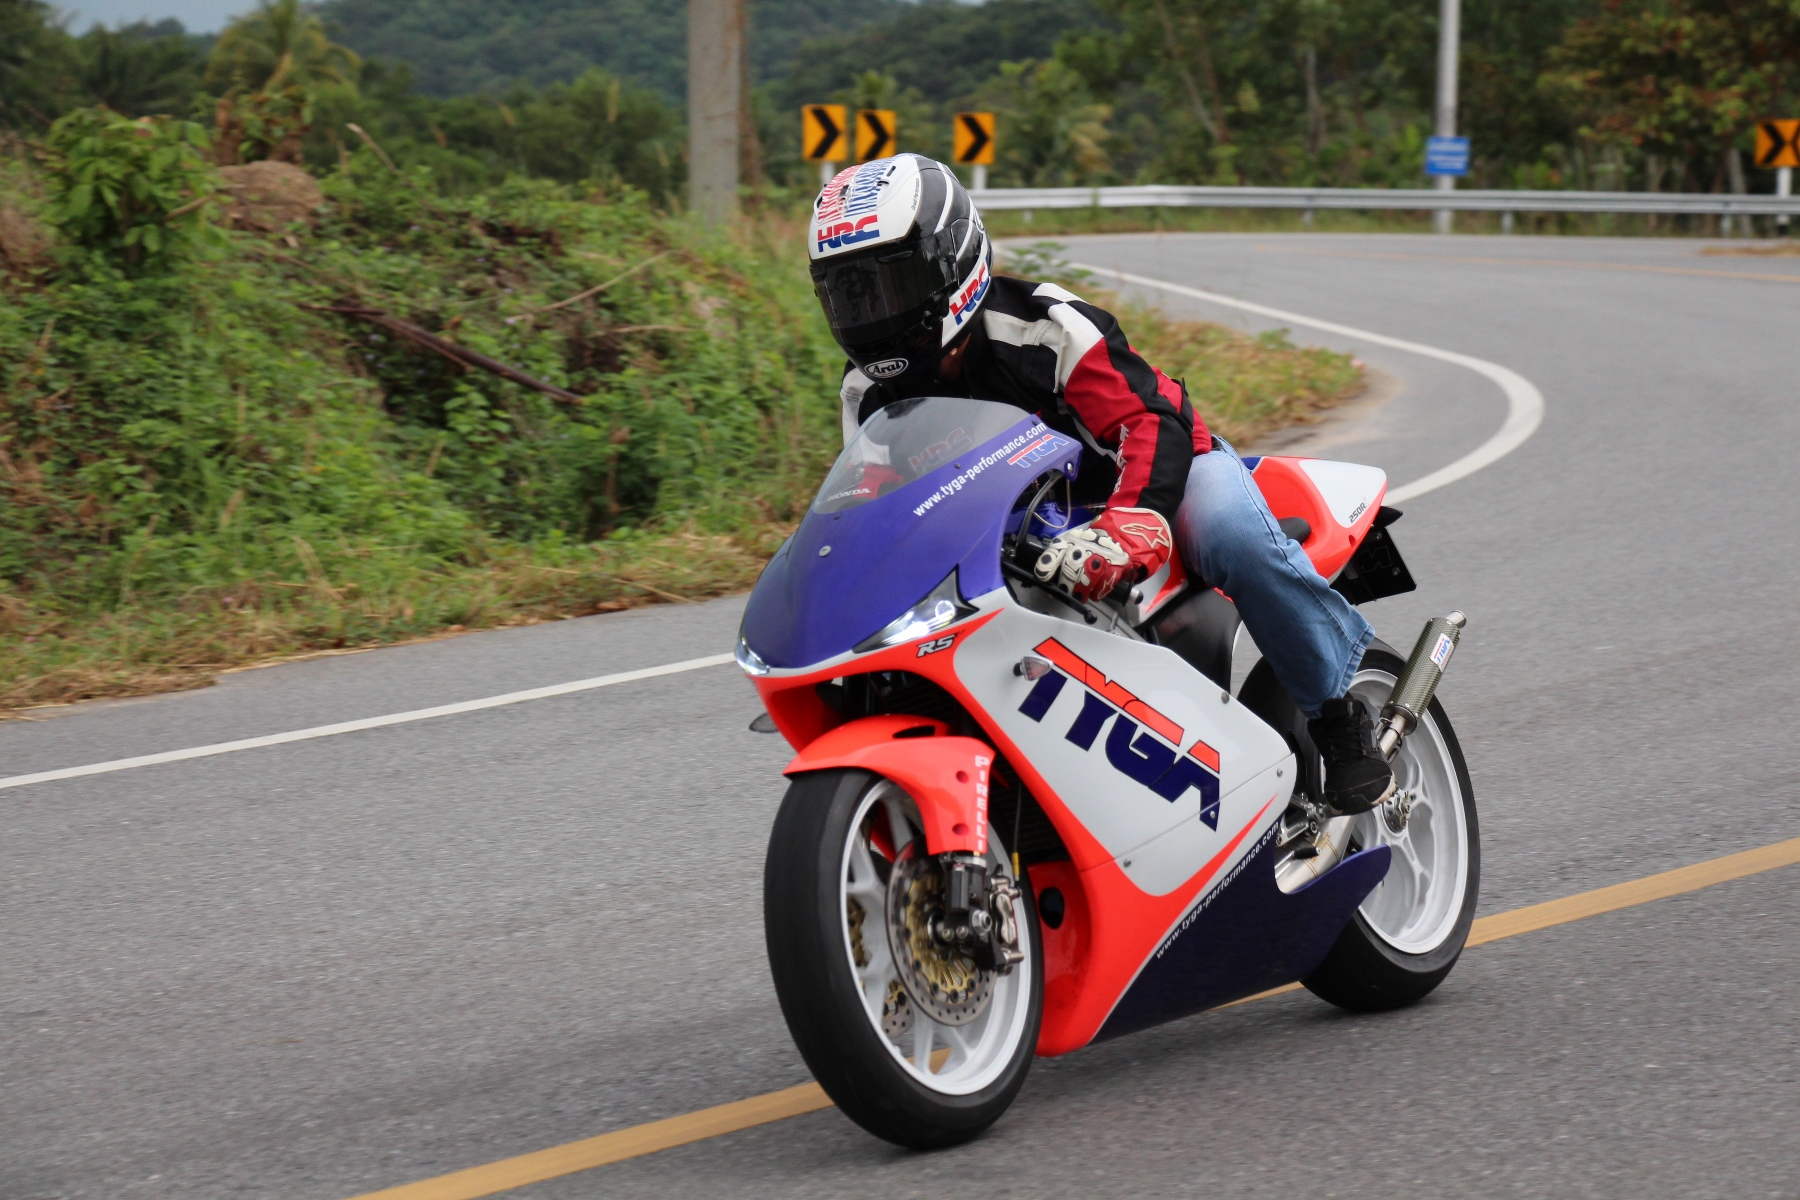 TYGA Street NX5 RS250R-S | TYGA-Performance